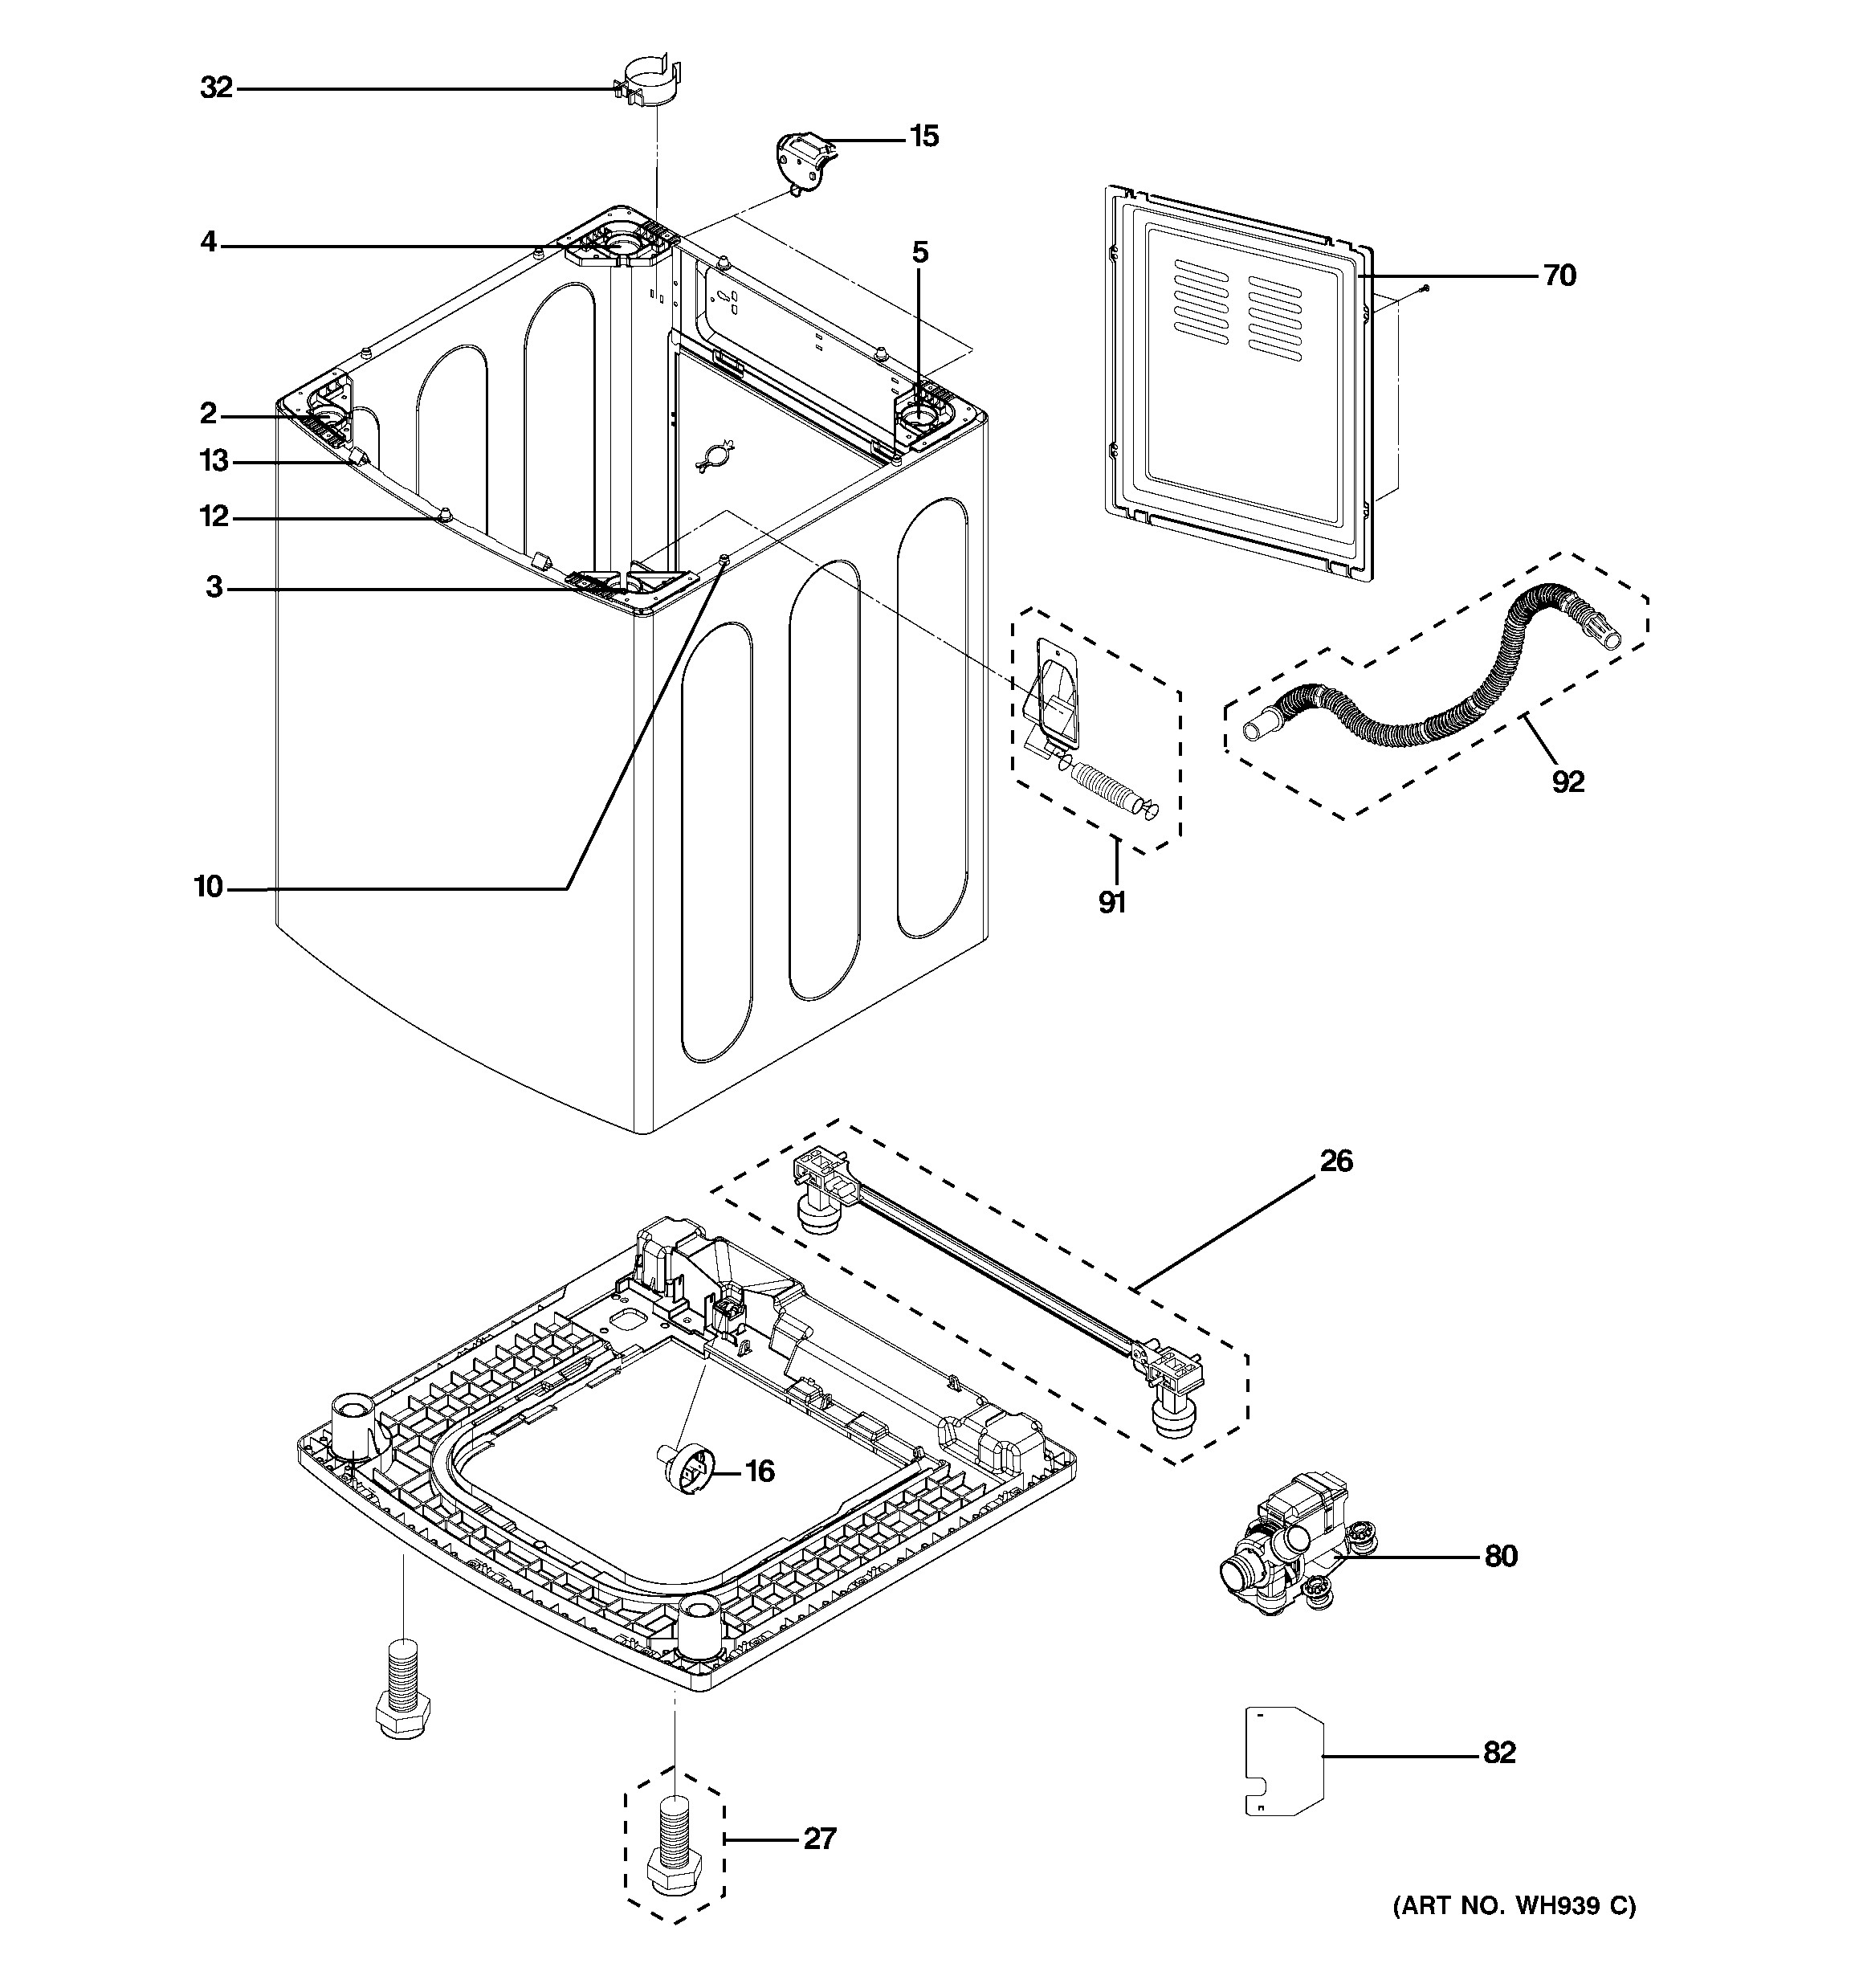 Ge Quiet Power 3 Parts Diagram Ge Washer Parts Model Ptwn8050m0ww Of Ge Quiet Power 3 Parts Diagram